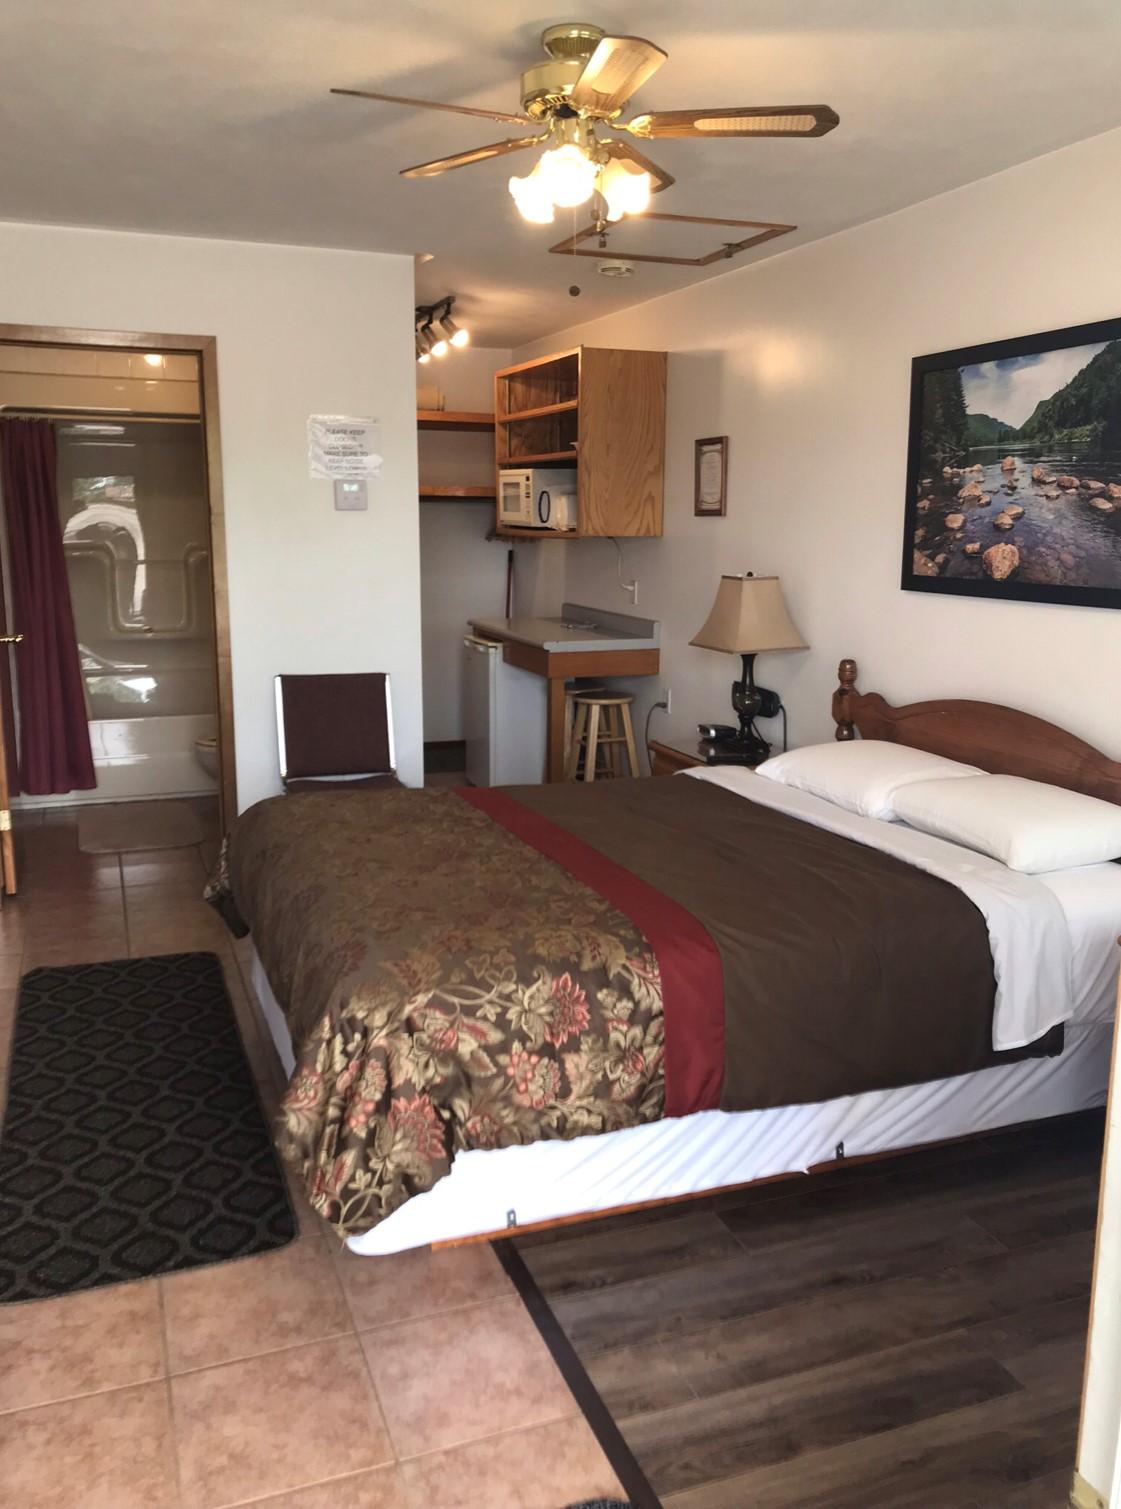 https://0901.nccdn.net/4_2/000/000/051/72c/jays-motel-room-with-1-beds.jpg